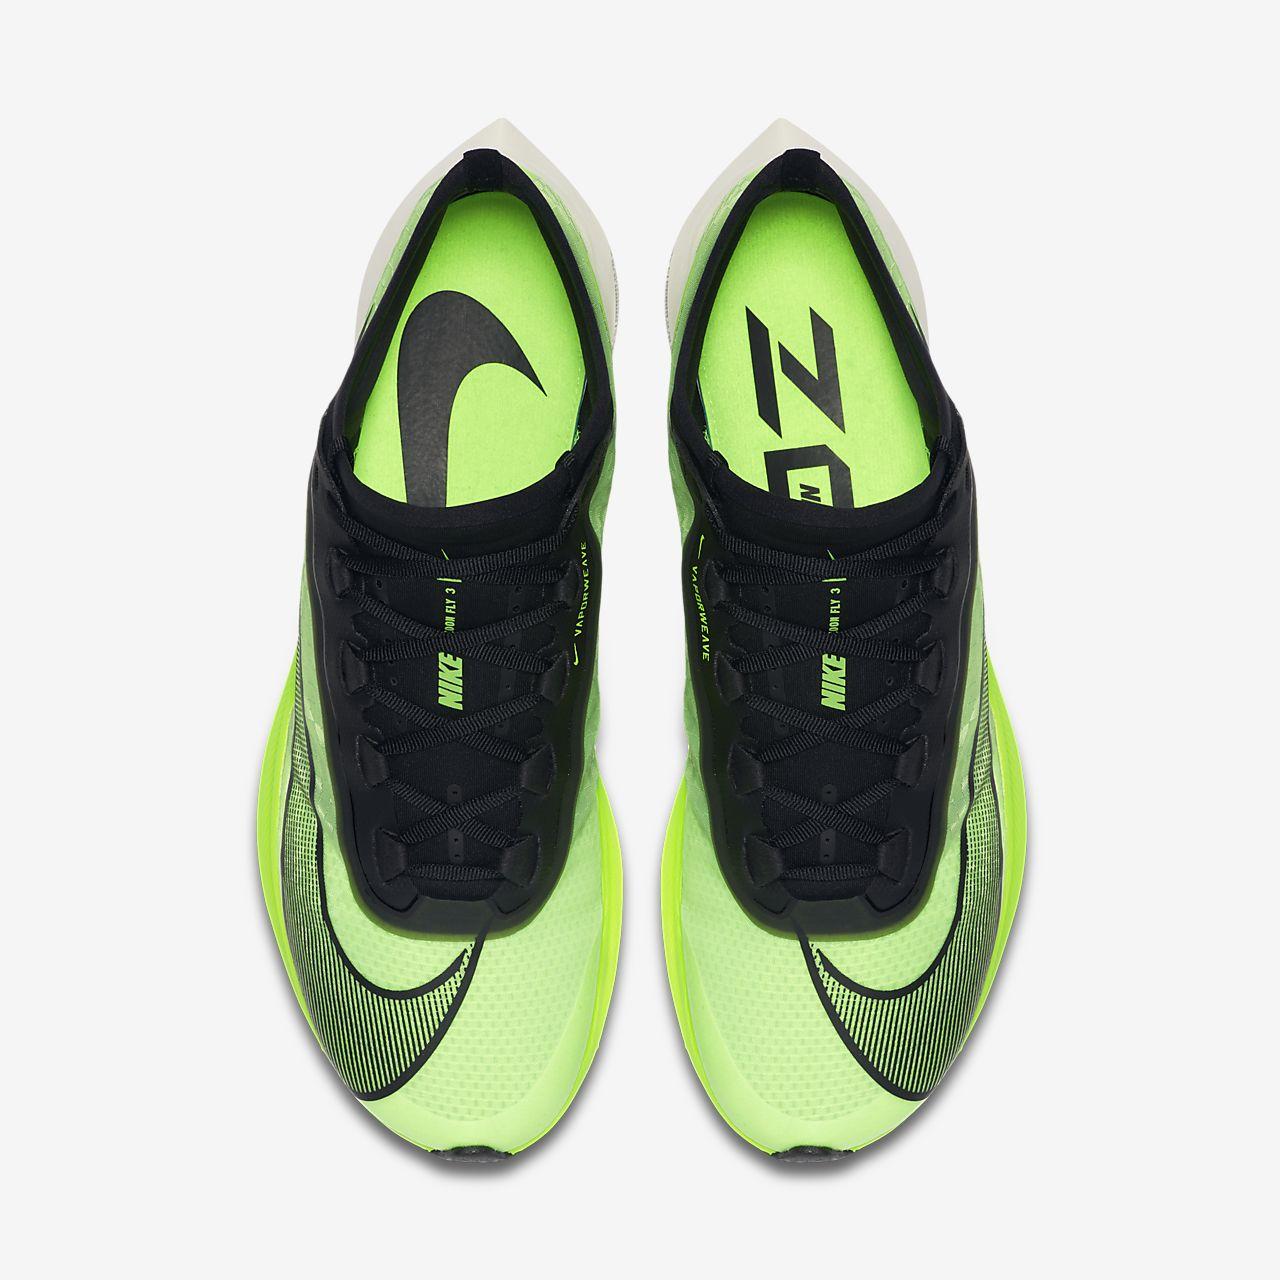 Pour De Running Zoom Nike Fly Kfjlt1c 3 Hommebe Chaussure UzSGMVqp